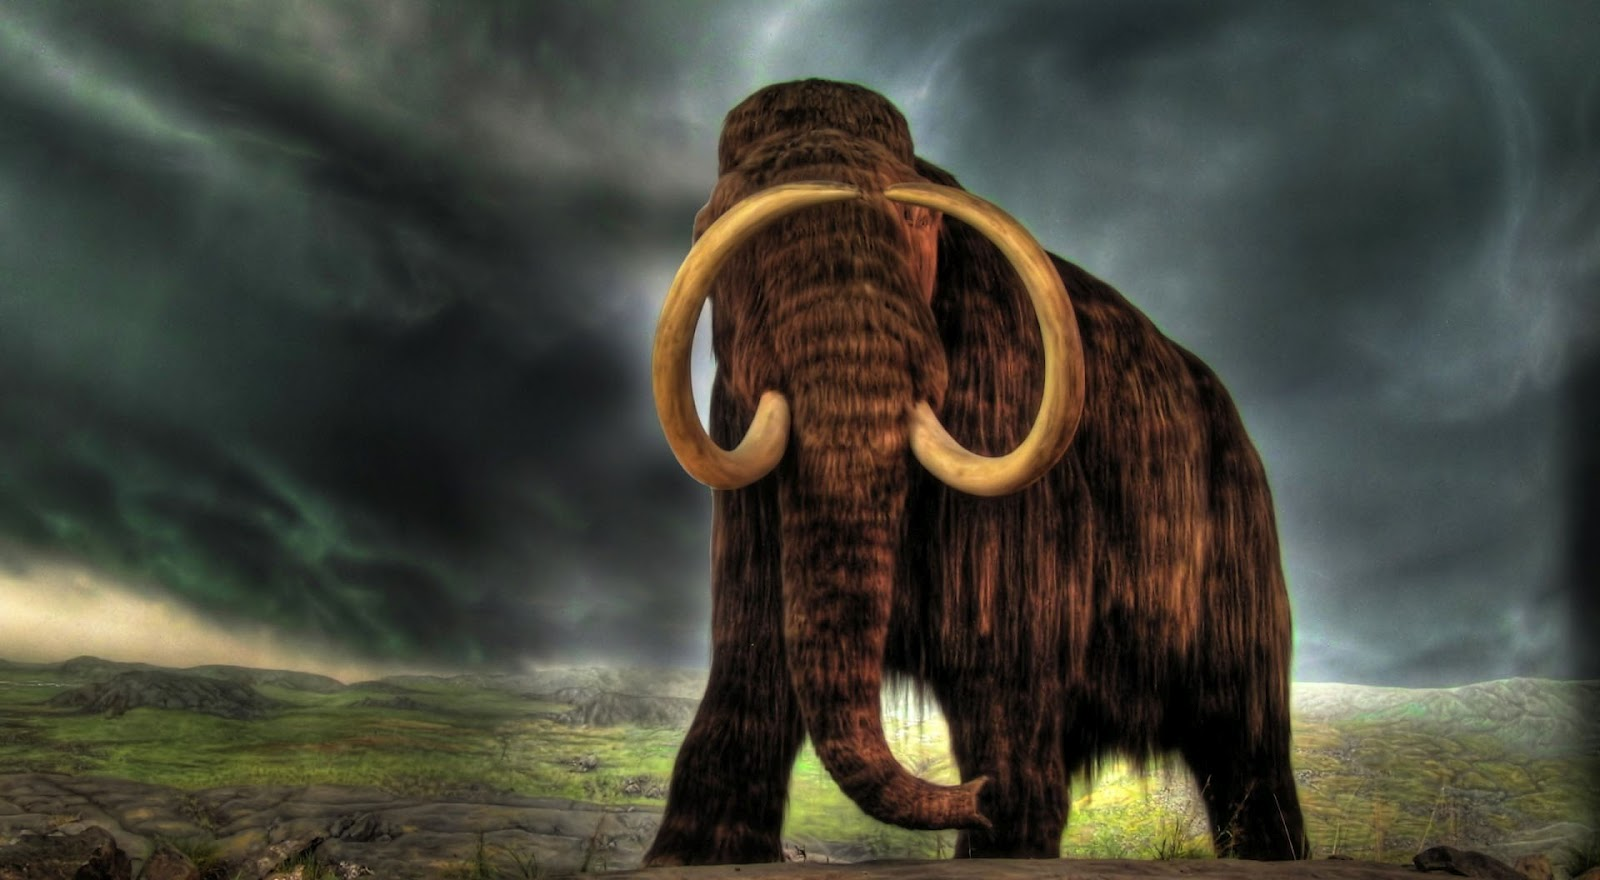 http://2.bp.blogspot.com/-CiP_HN59vkw/UE3P3Yp7xkI/AAAAAAAABeI/dnzuNIfAJiY/s1600/mammoth-wallpaper-1920x1080.jpg